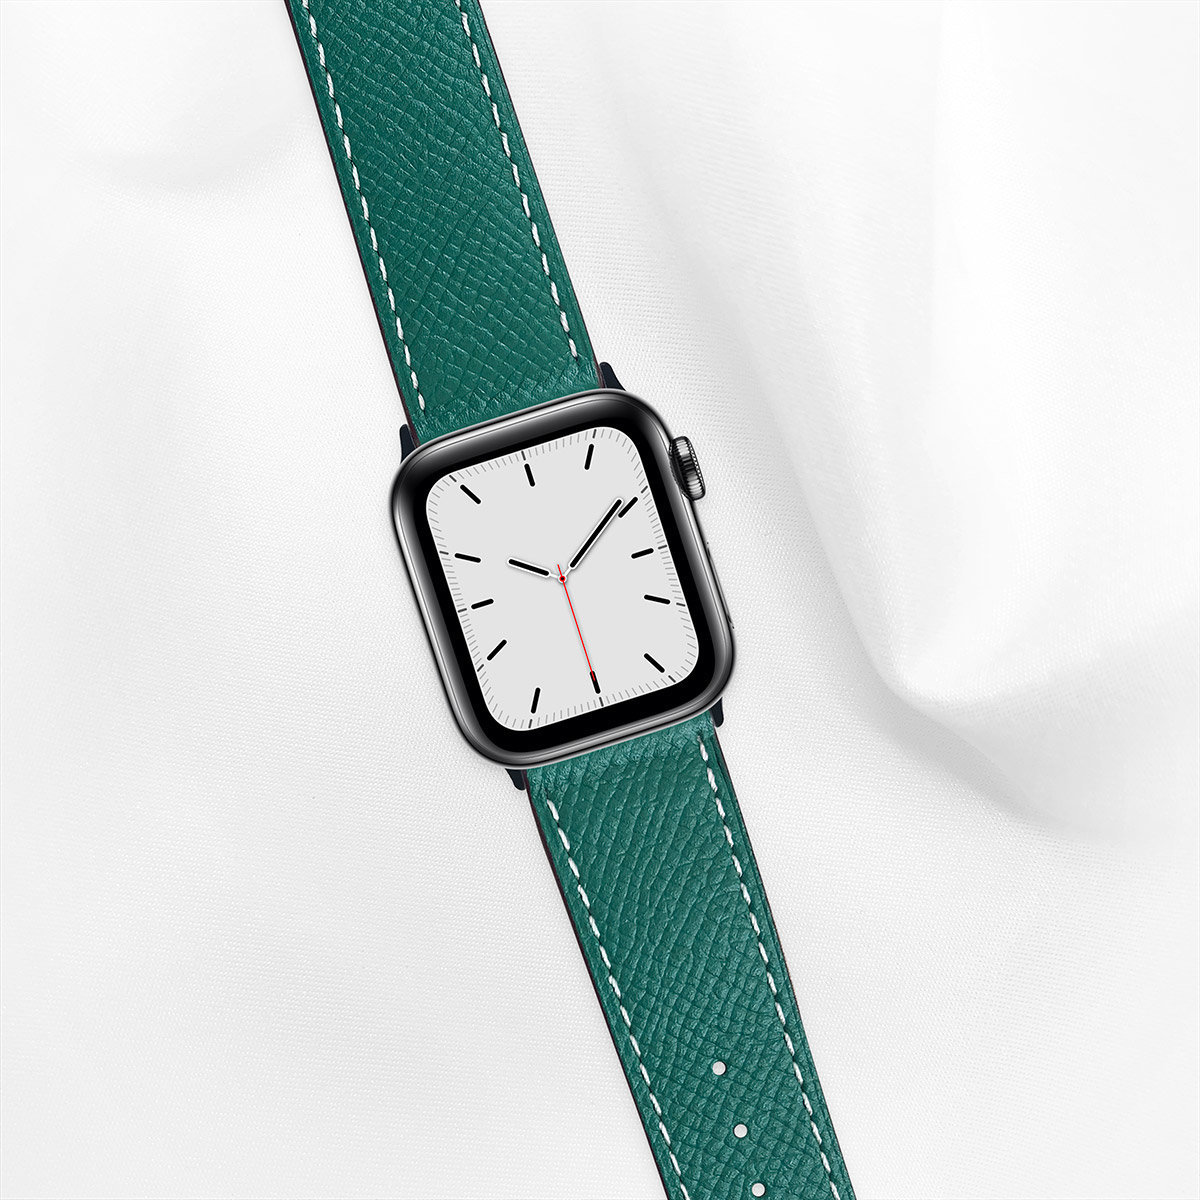 40mm Apple Watch Strap, Epsom Leather, Ultramarine Green